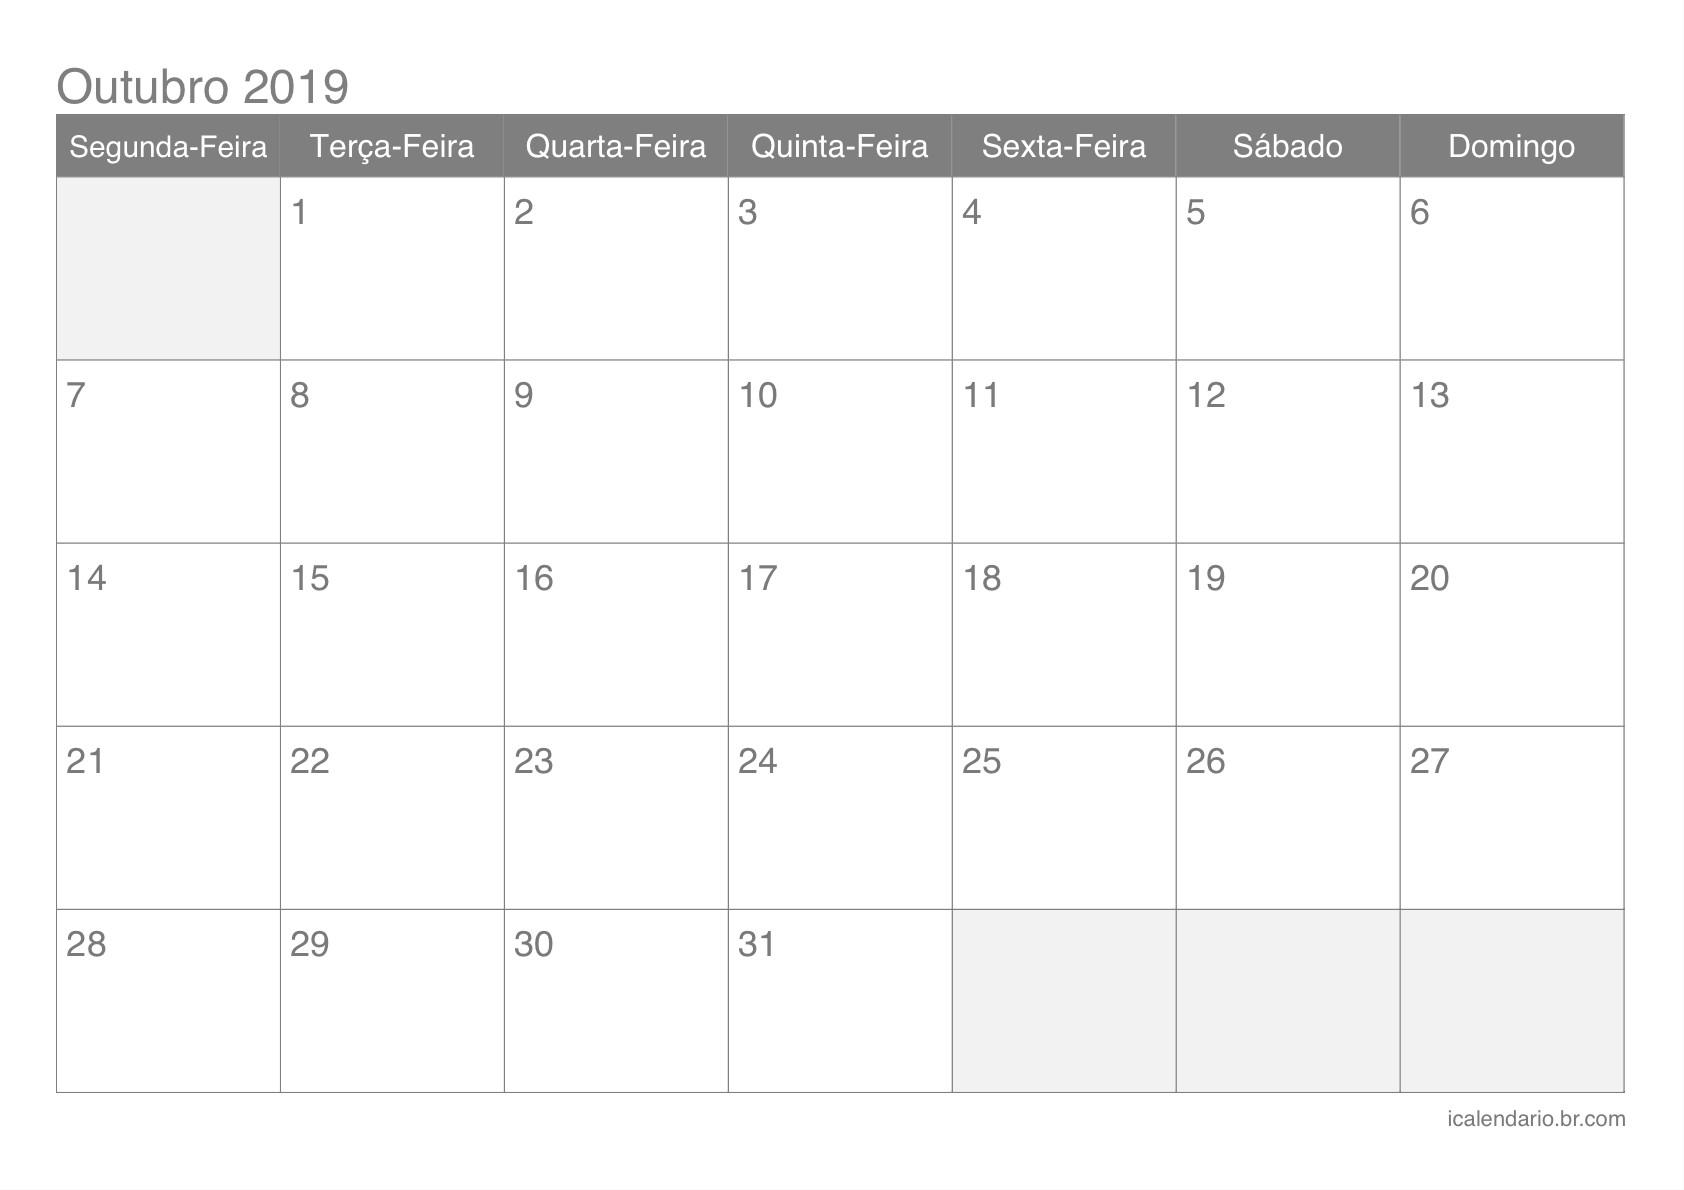 Calendario 2019 Portugues Para Imprimir Com Feriados Mejores Y Más Novedosos 41 Best Calendário Maio 2019 Para Imprimir Images In 2019 Of Calendario 2019 Portugues Para Imprimir Com Feriados Mejores Y Más Novedosos Abril 2019 Con Festivos Word Calendario T